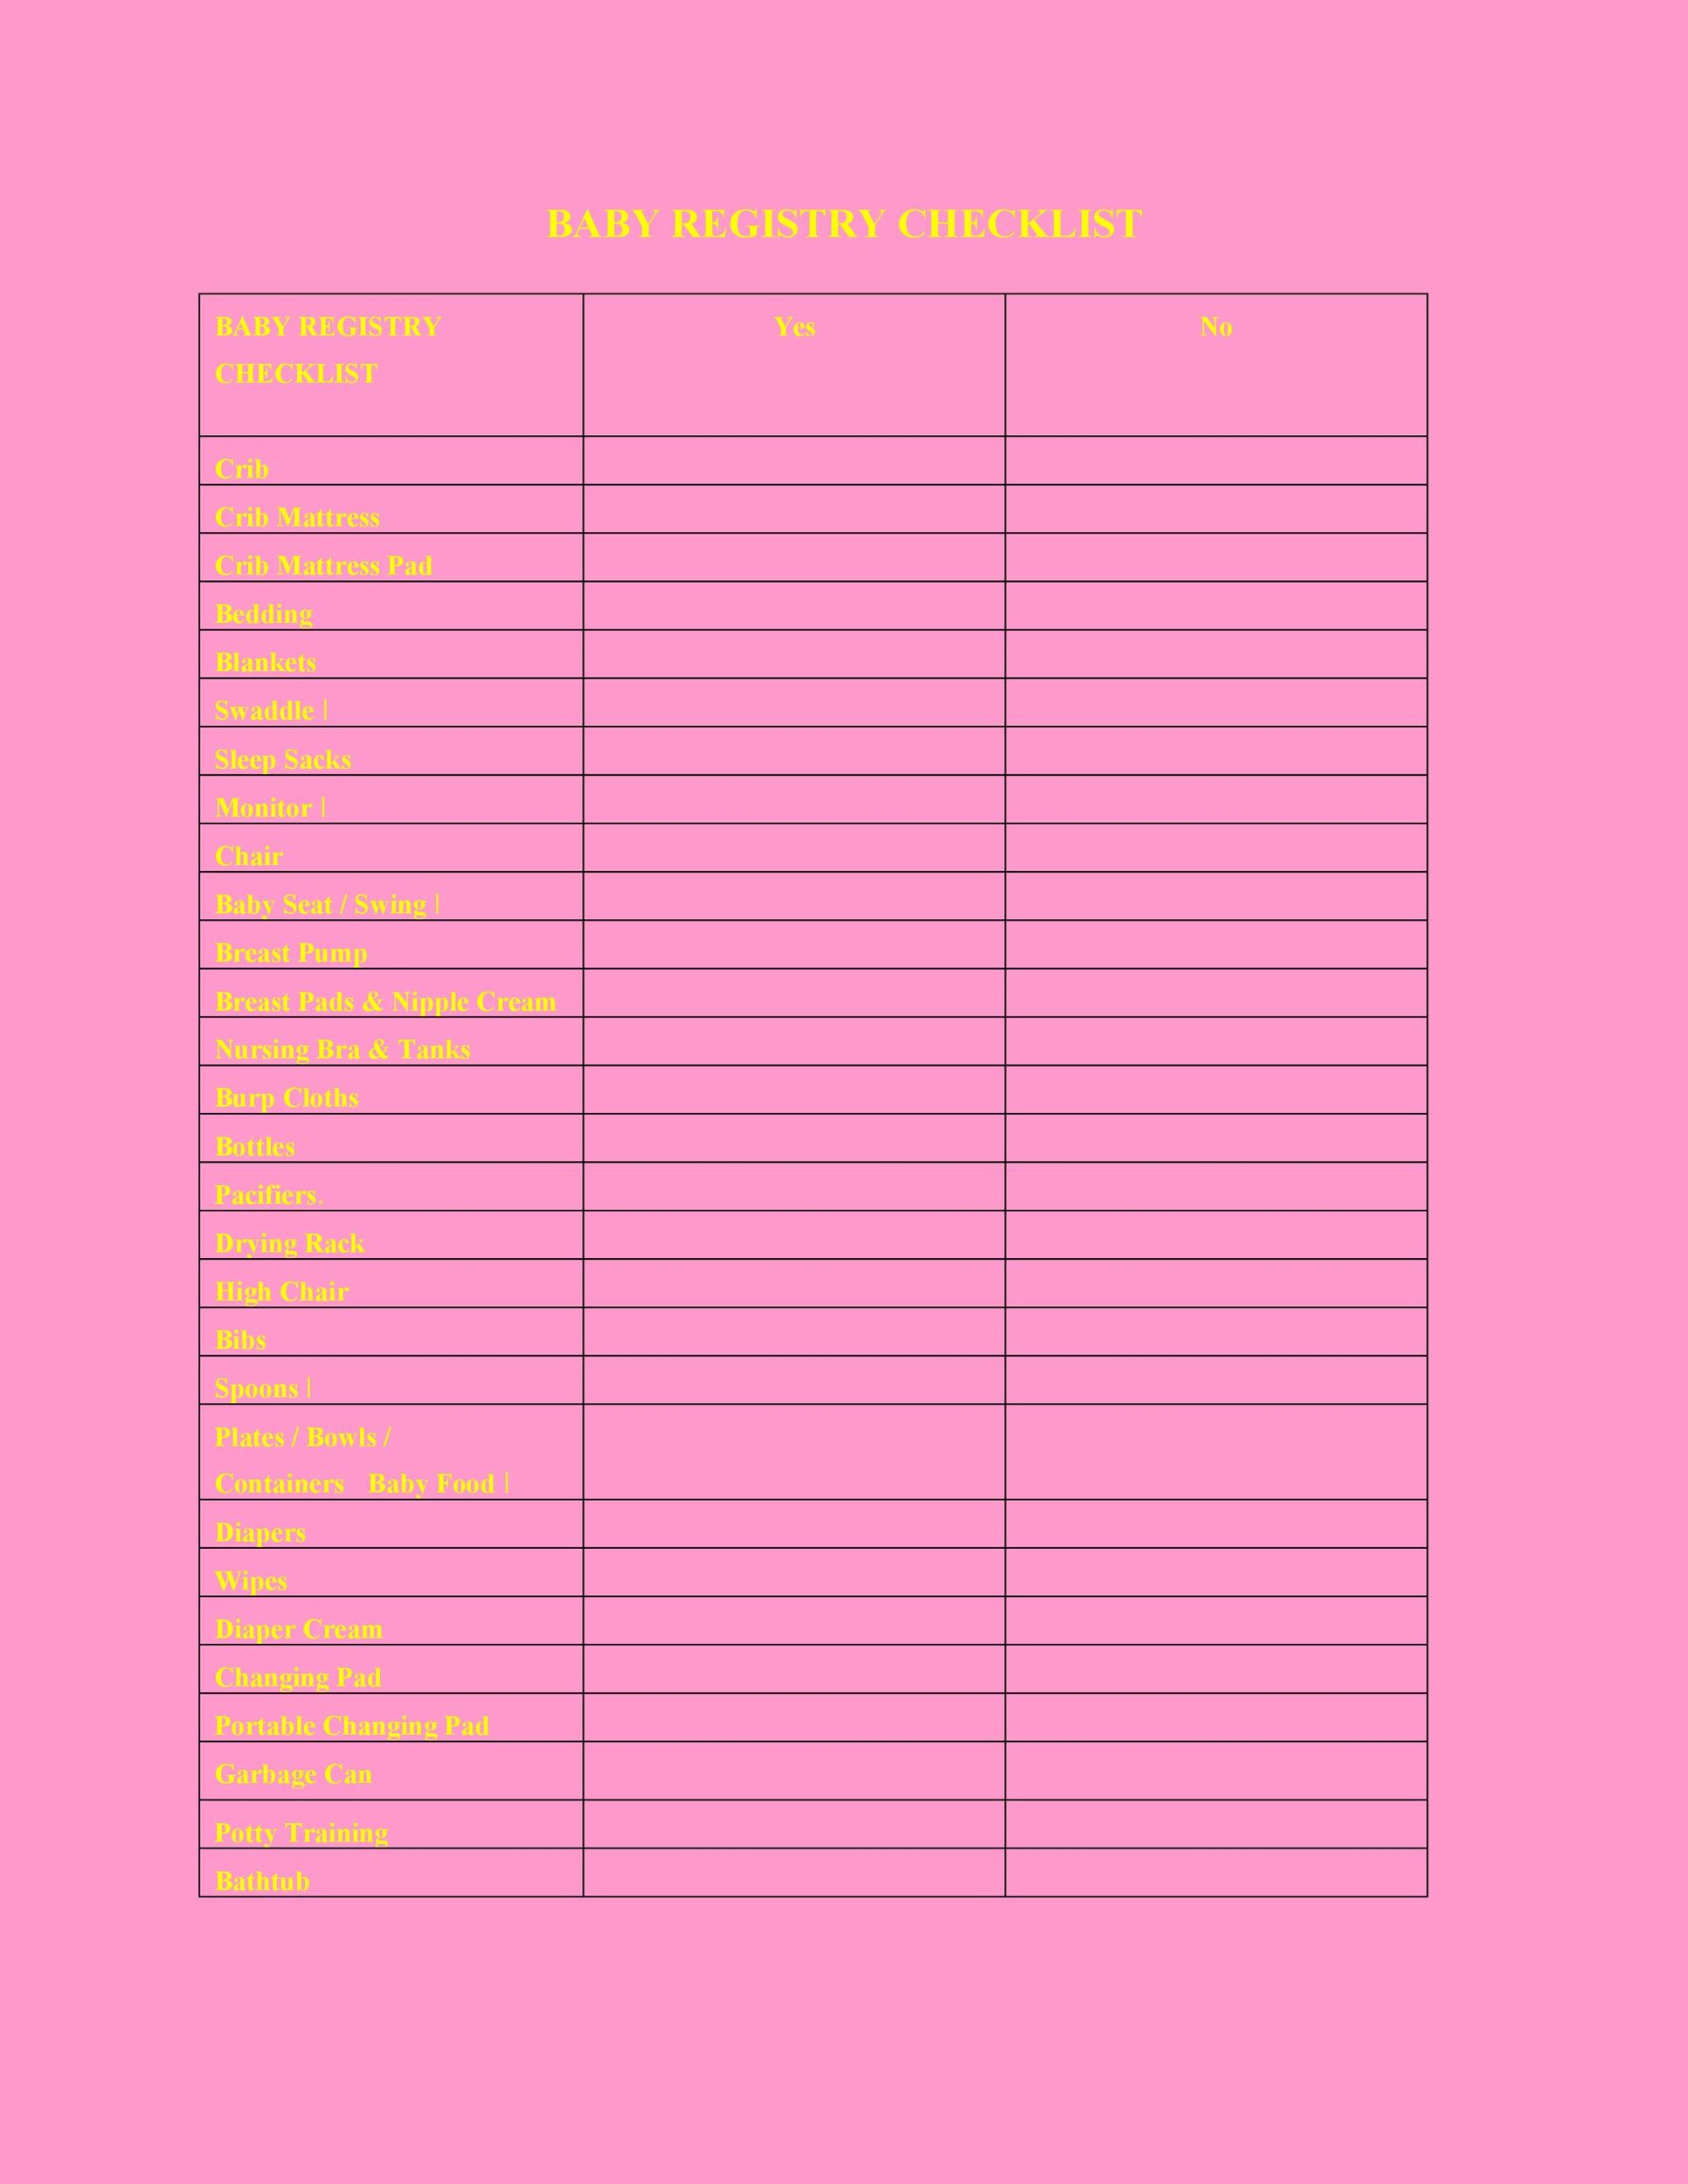 Free Baby Registry Checklist 29